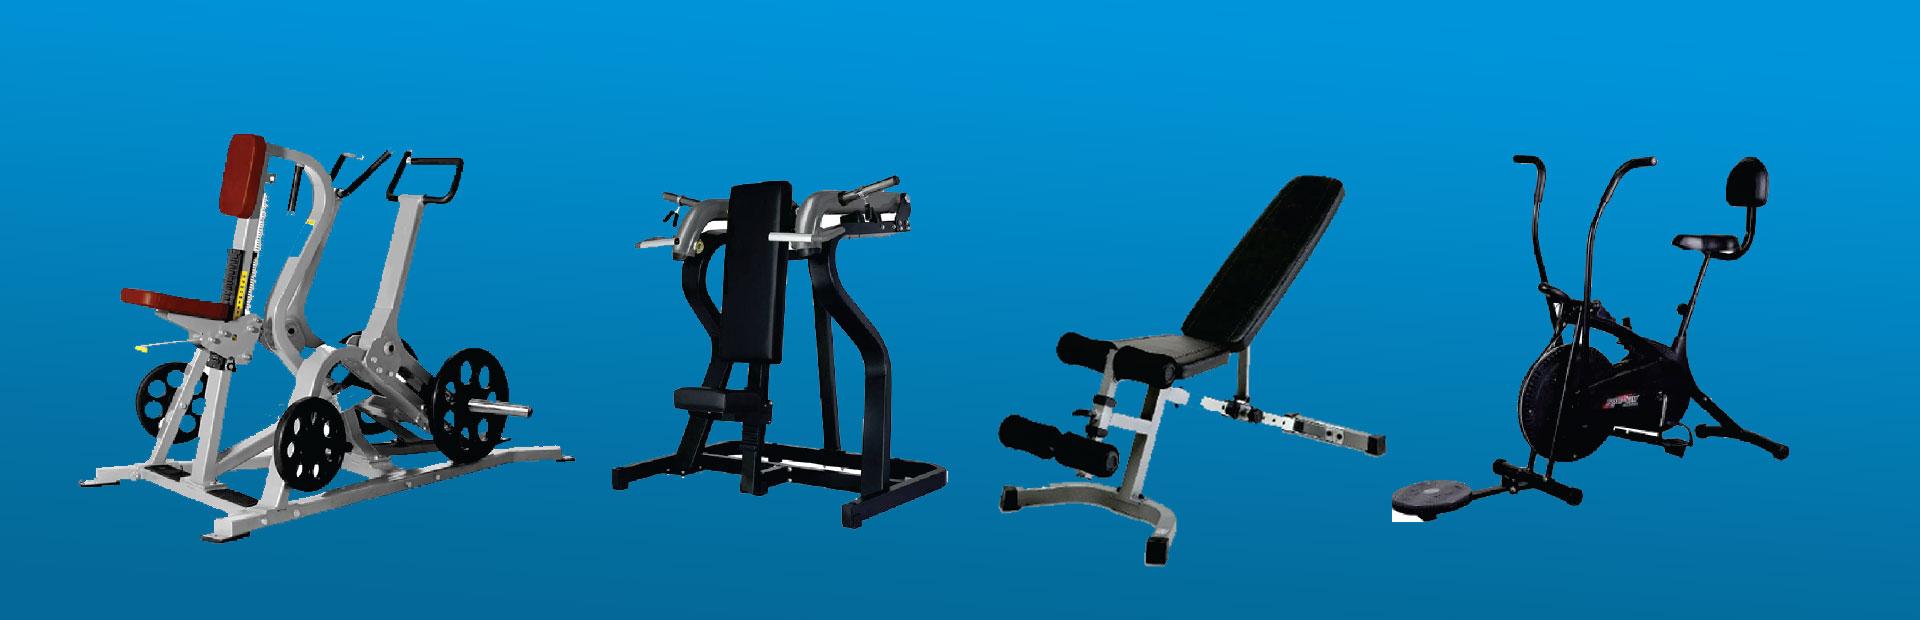 gym-equipment